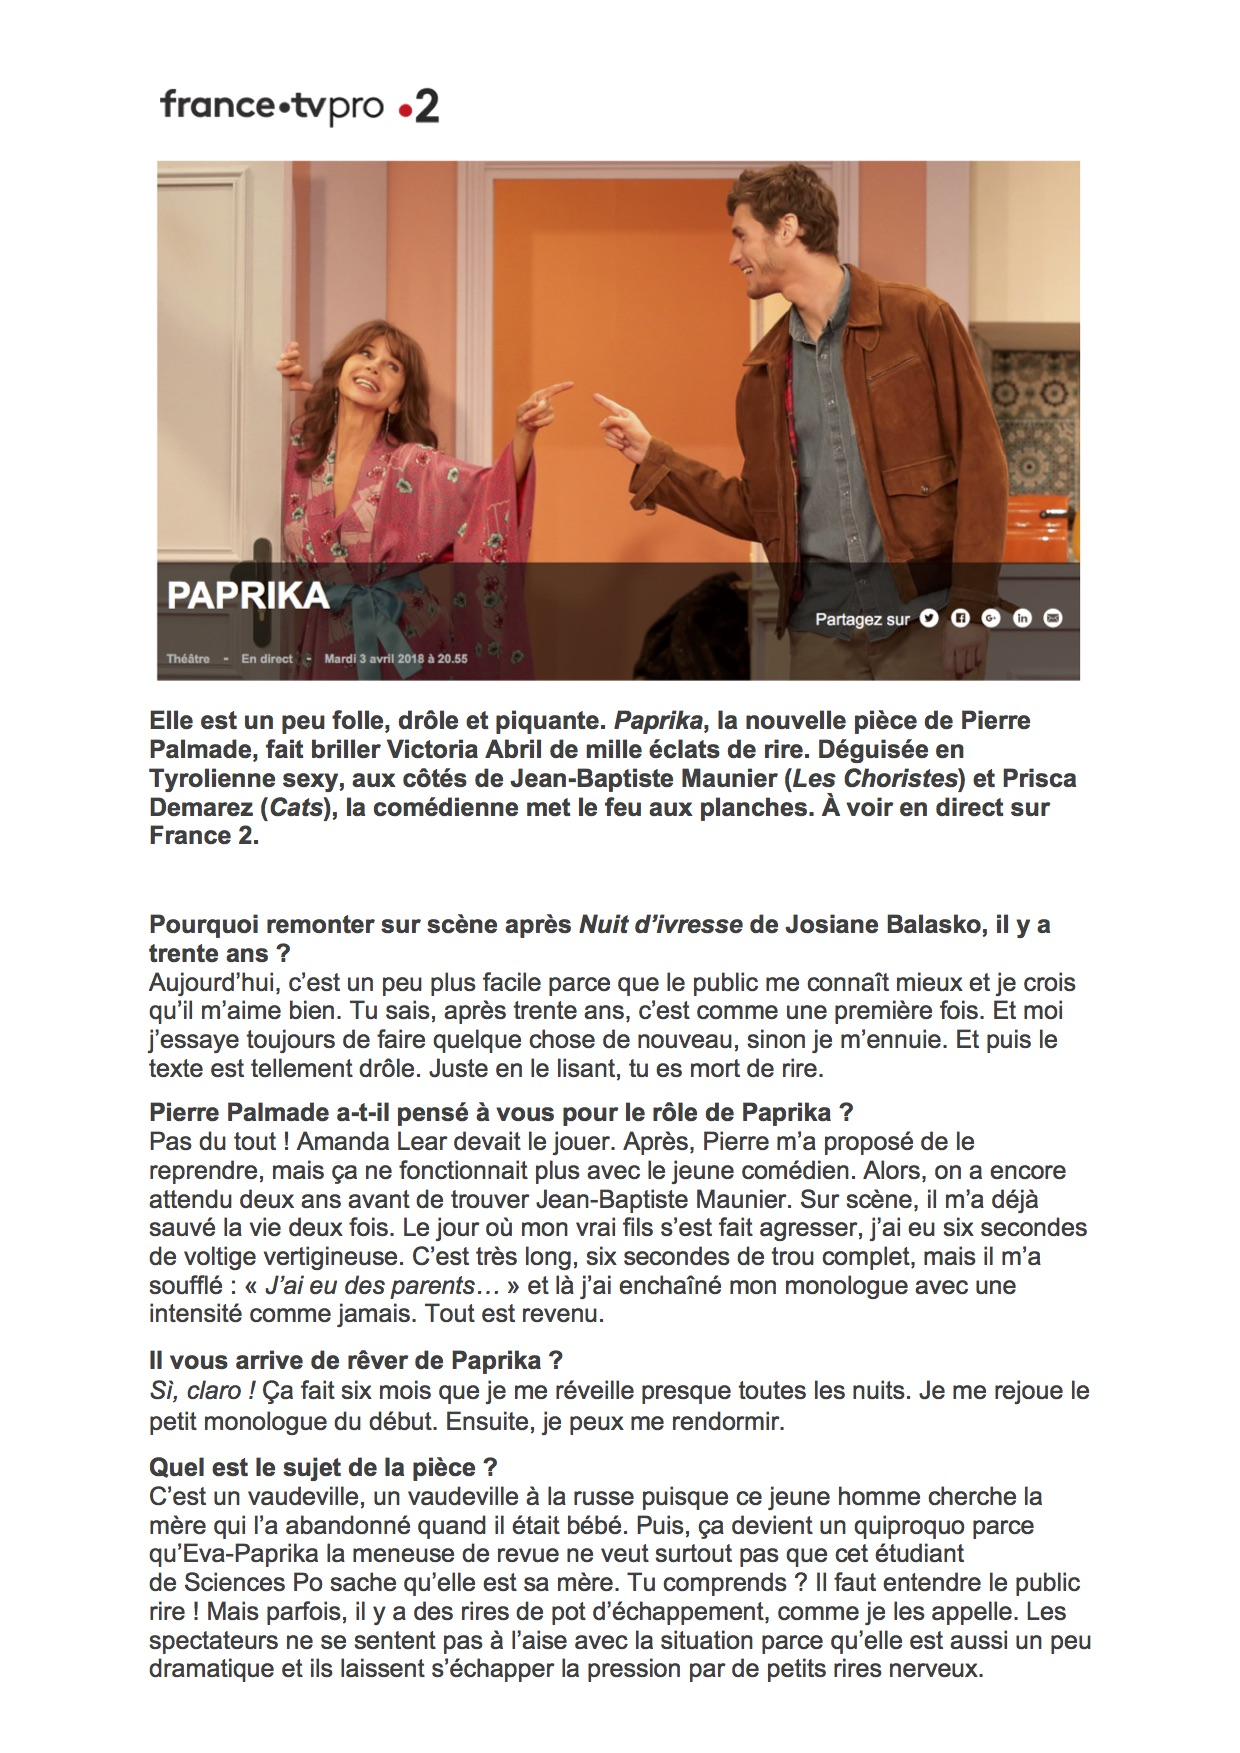 FranceTVpro 14.03.18 p1